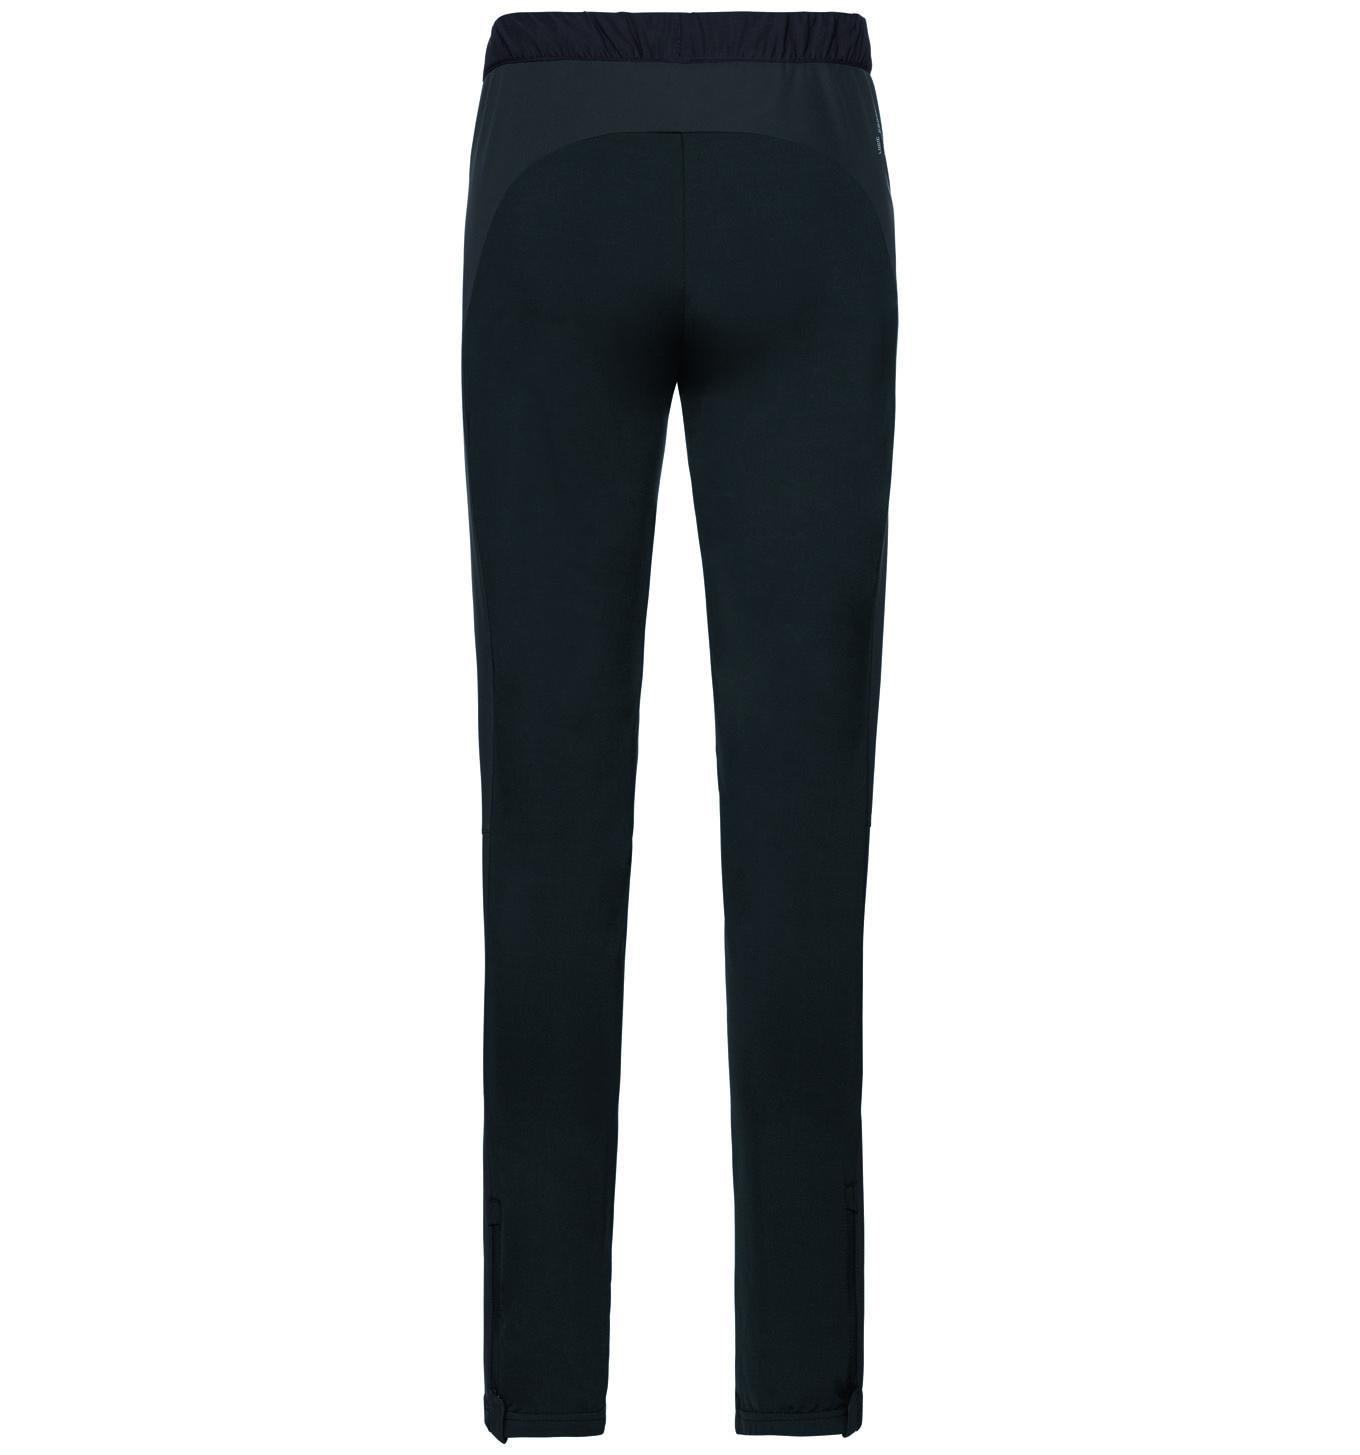 Aeolus Black Element Element Pant Pant Black Warm Warm Aeolus 0wOnk8P